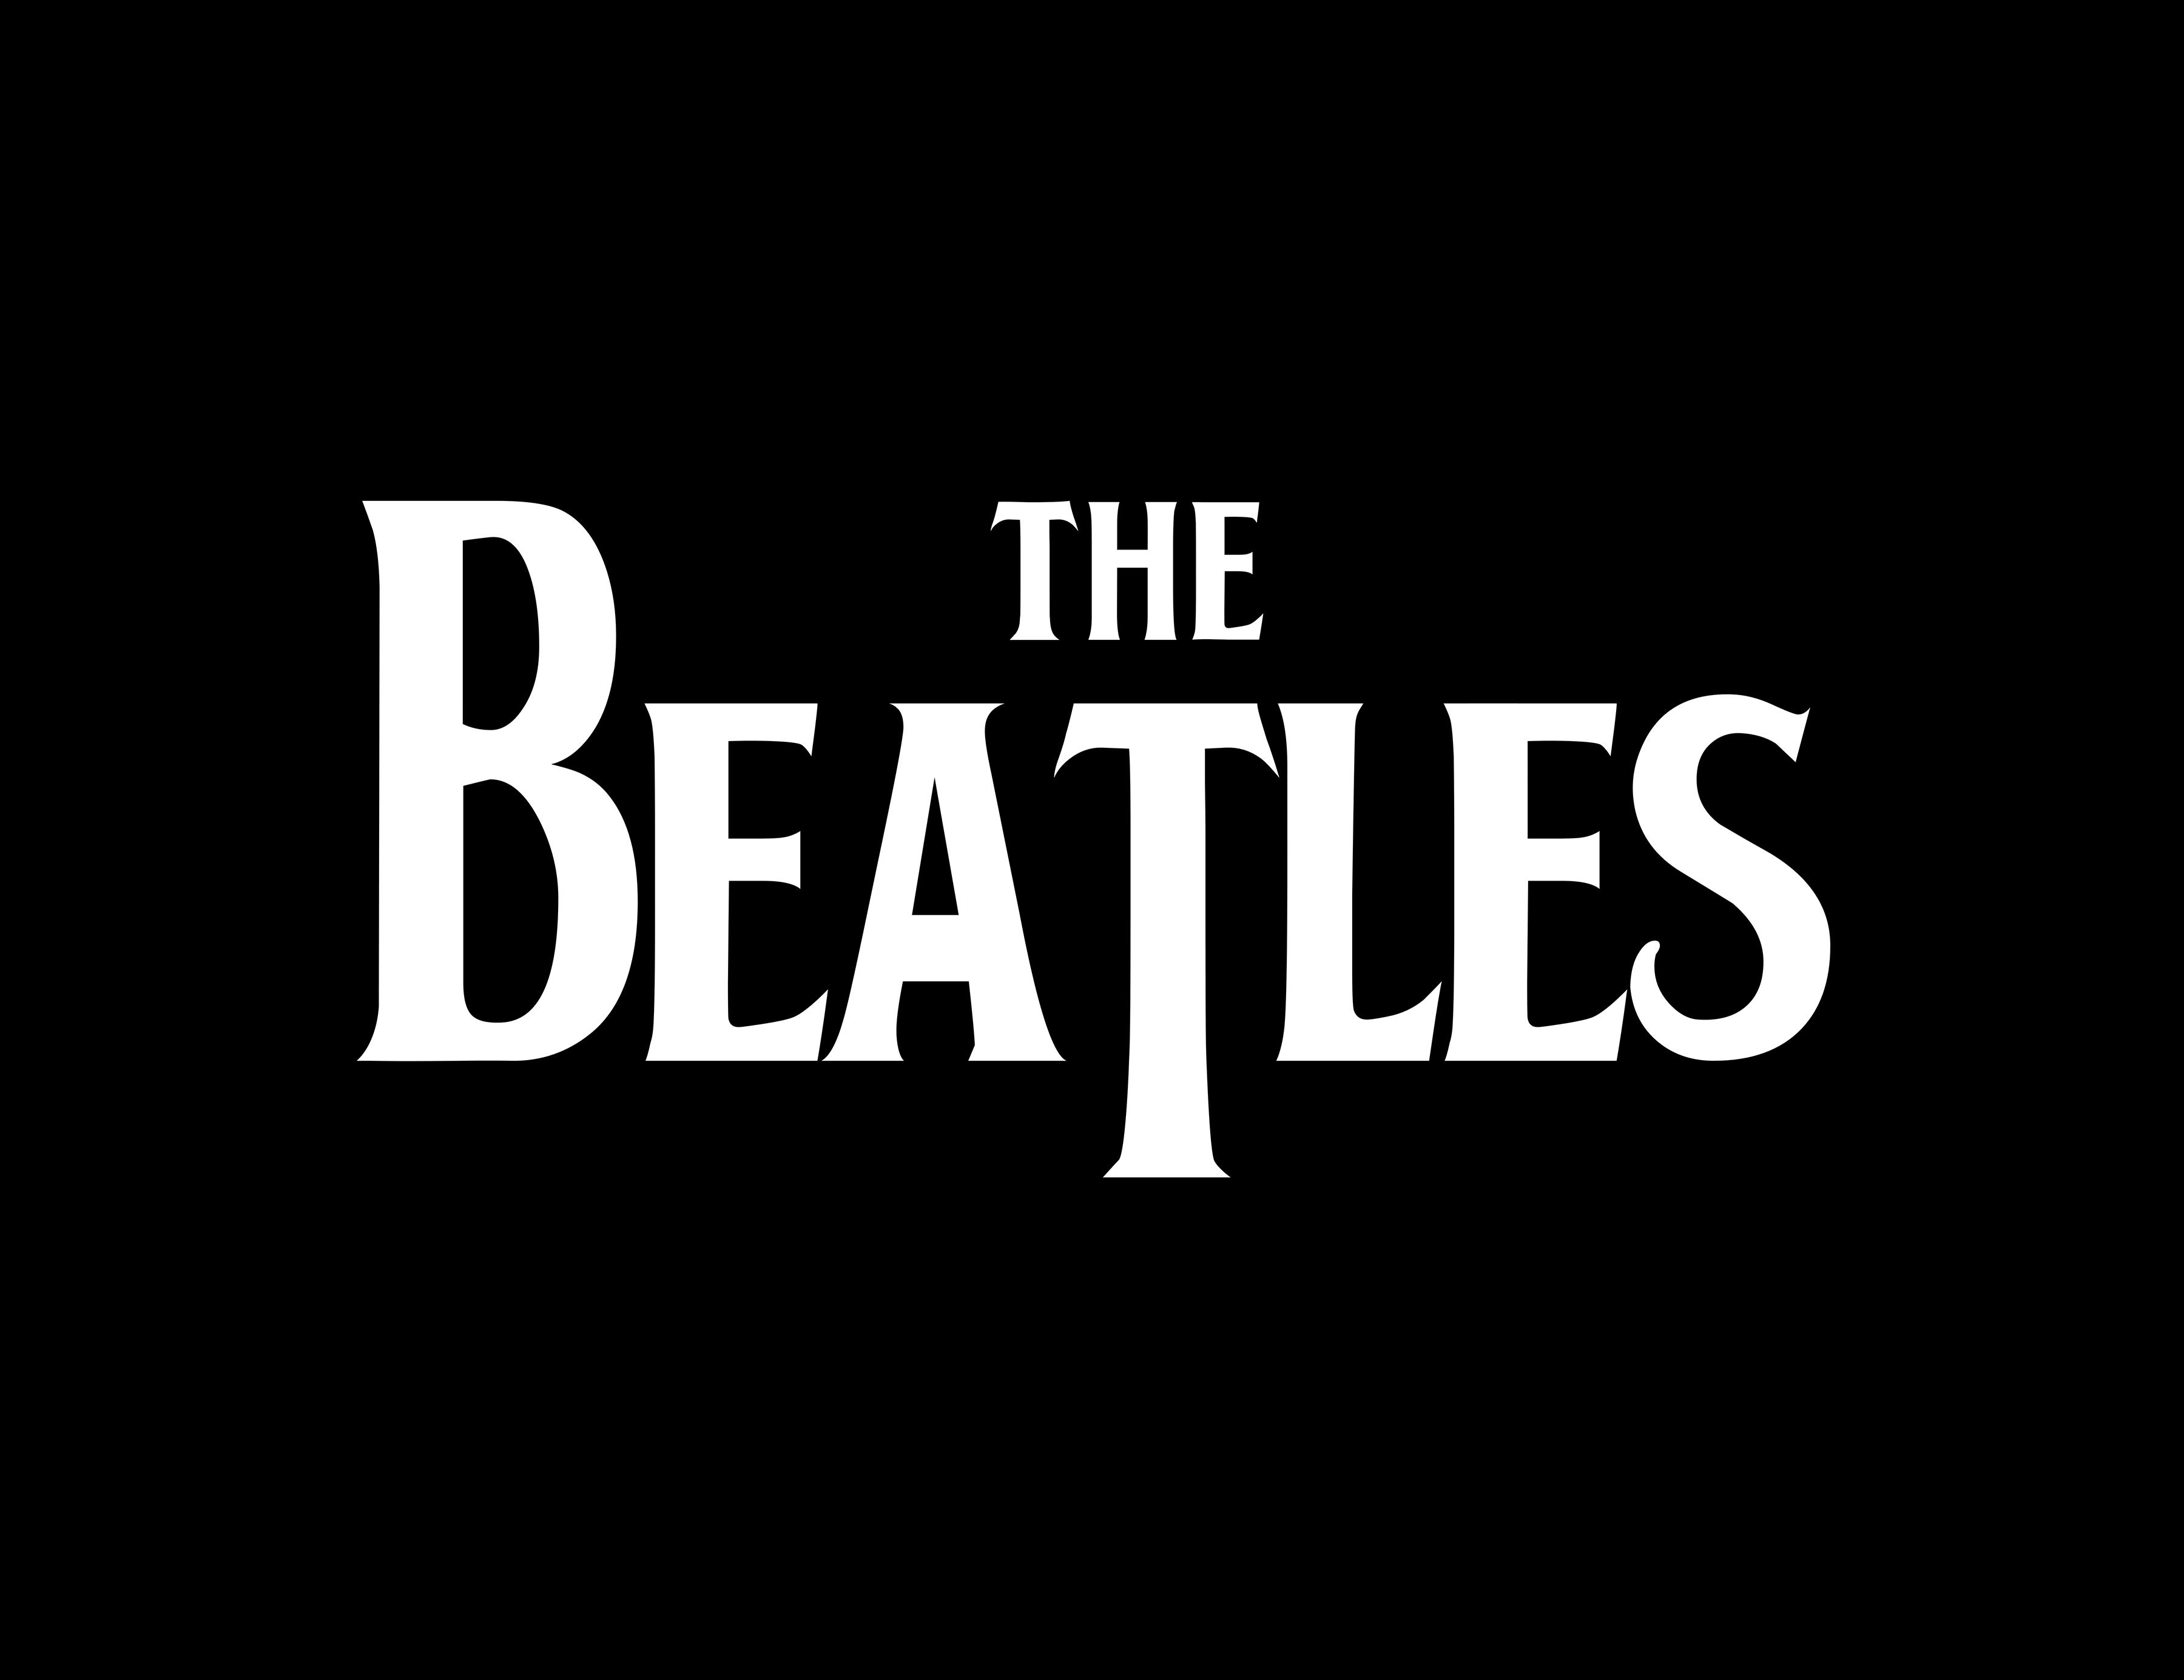 Image Result For Beatles Logo Beatles Art The Beatles Logos